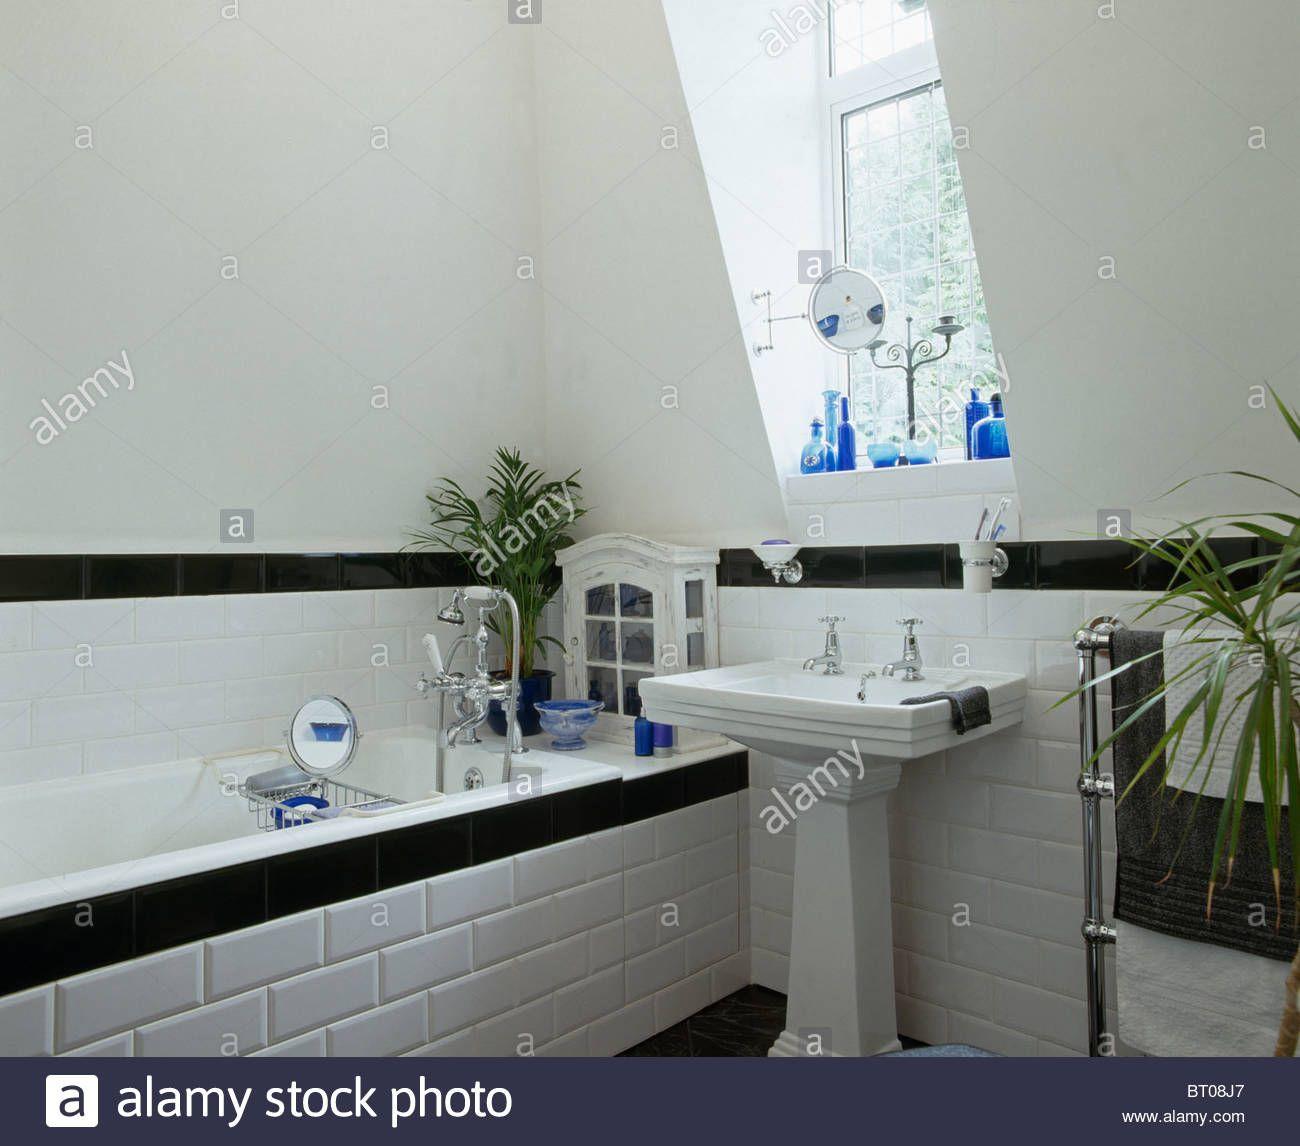 Image result for blue and white tiled bathroom Tiled